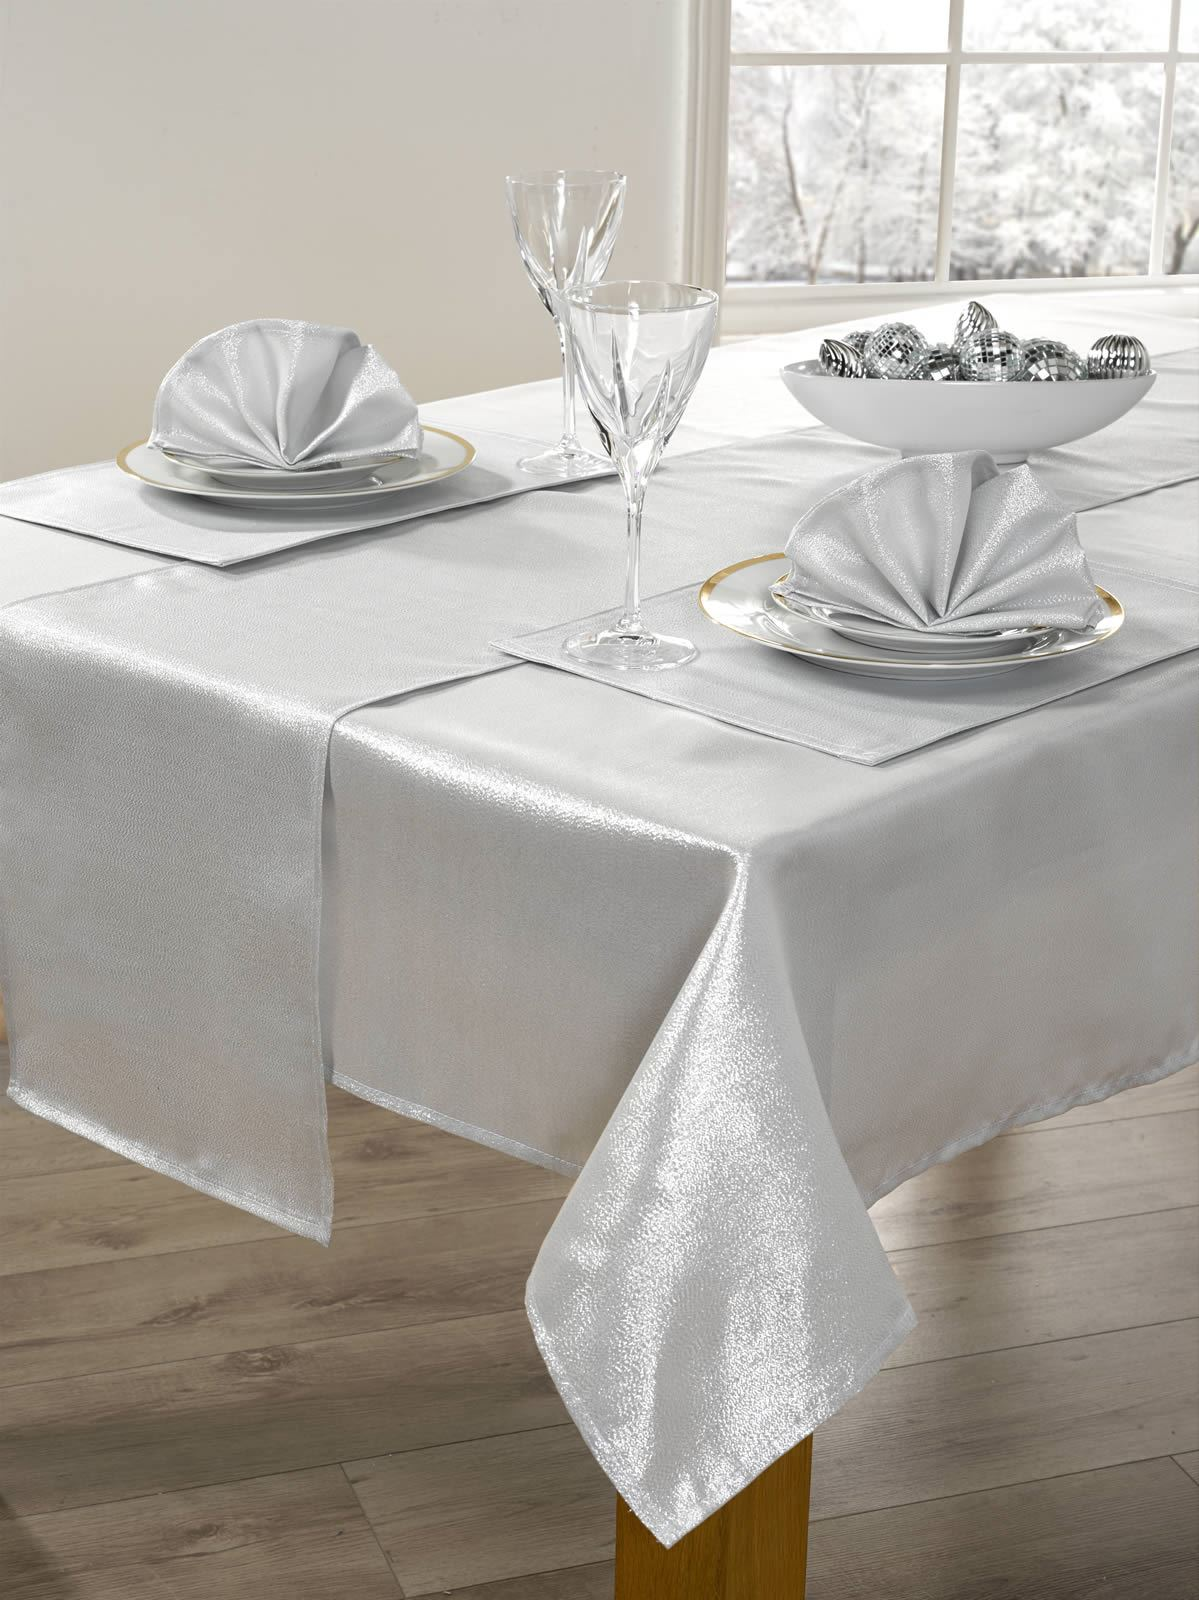 14 PIECE CHRISTMAS TABLE CLOTH LINEN SET NAPKINS RUNNER ...